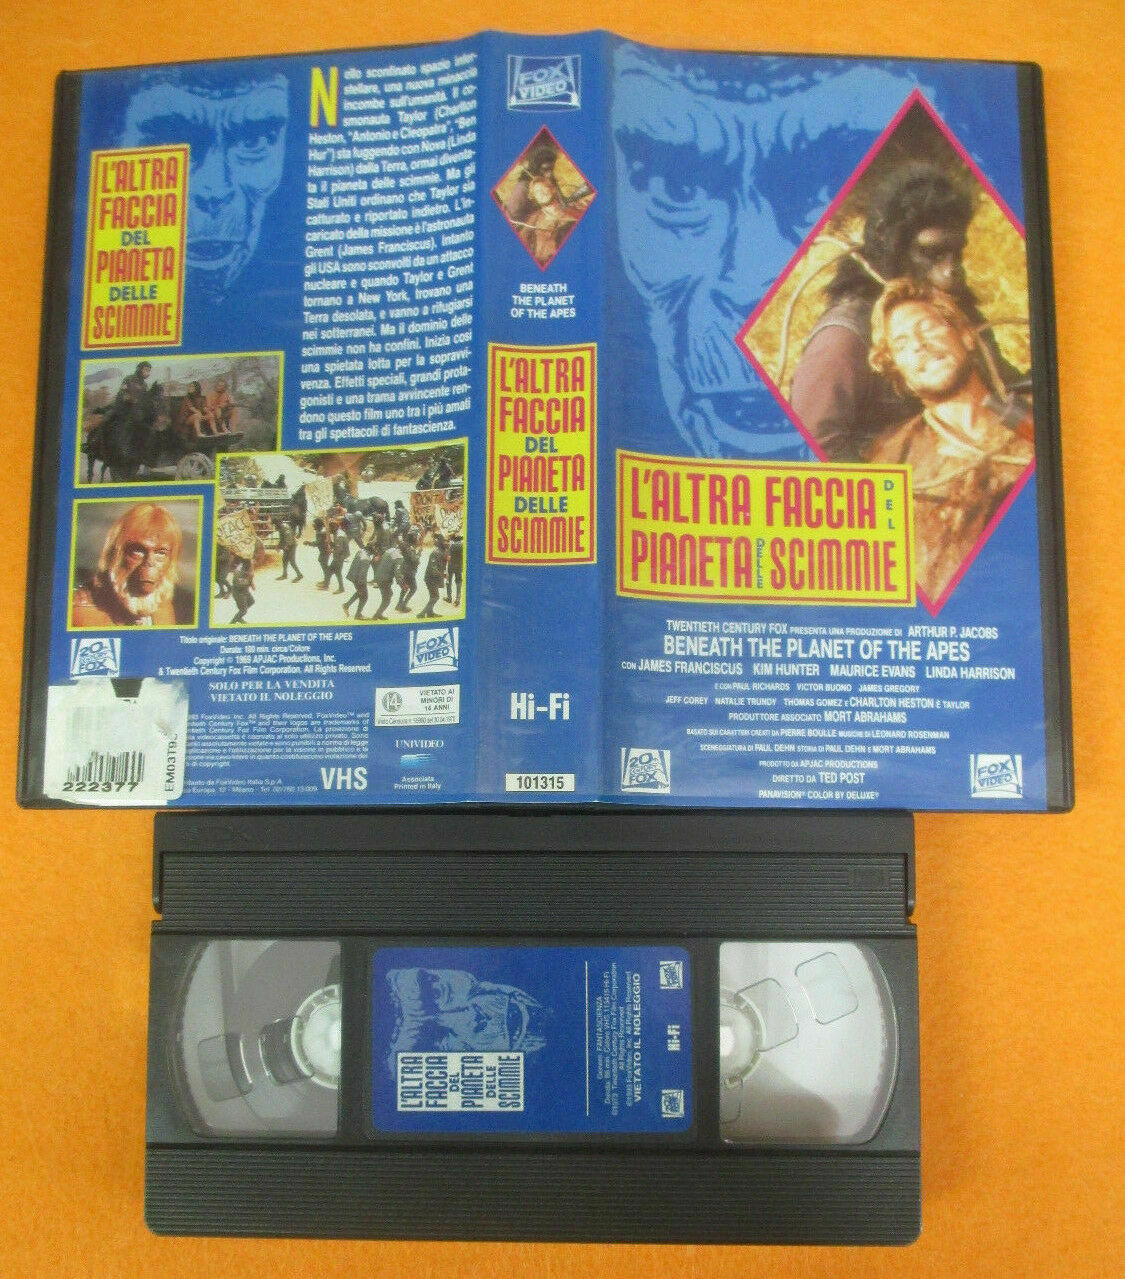 orologi digitali corsaro blu 1993